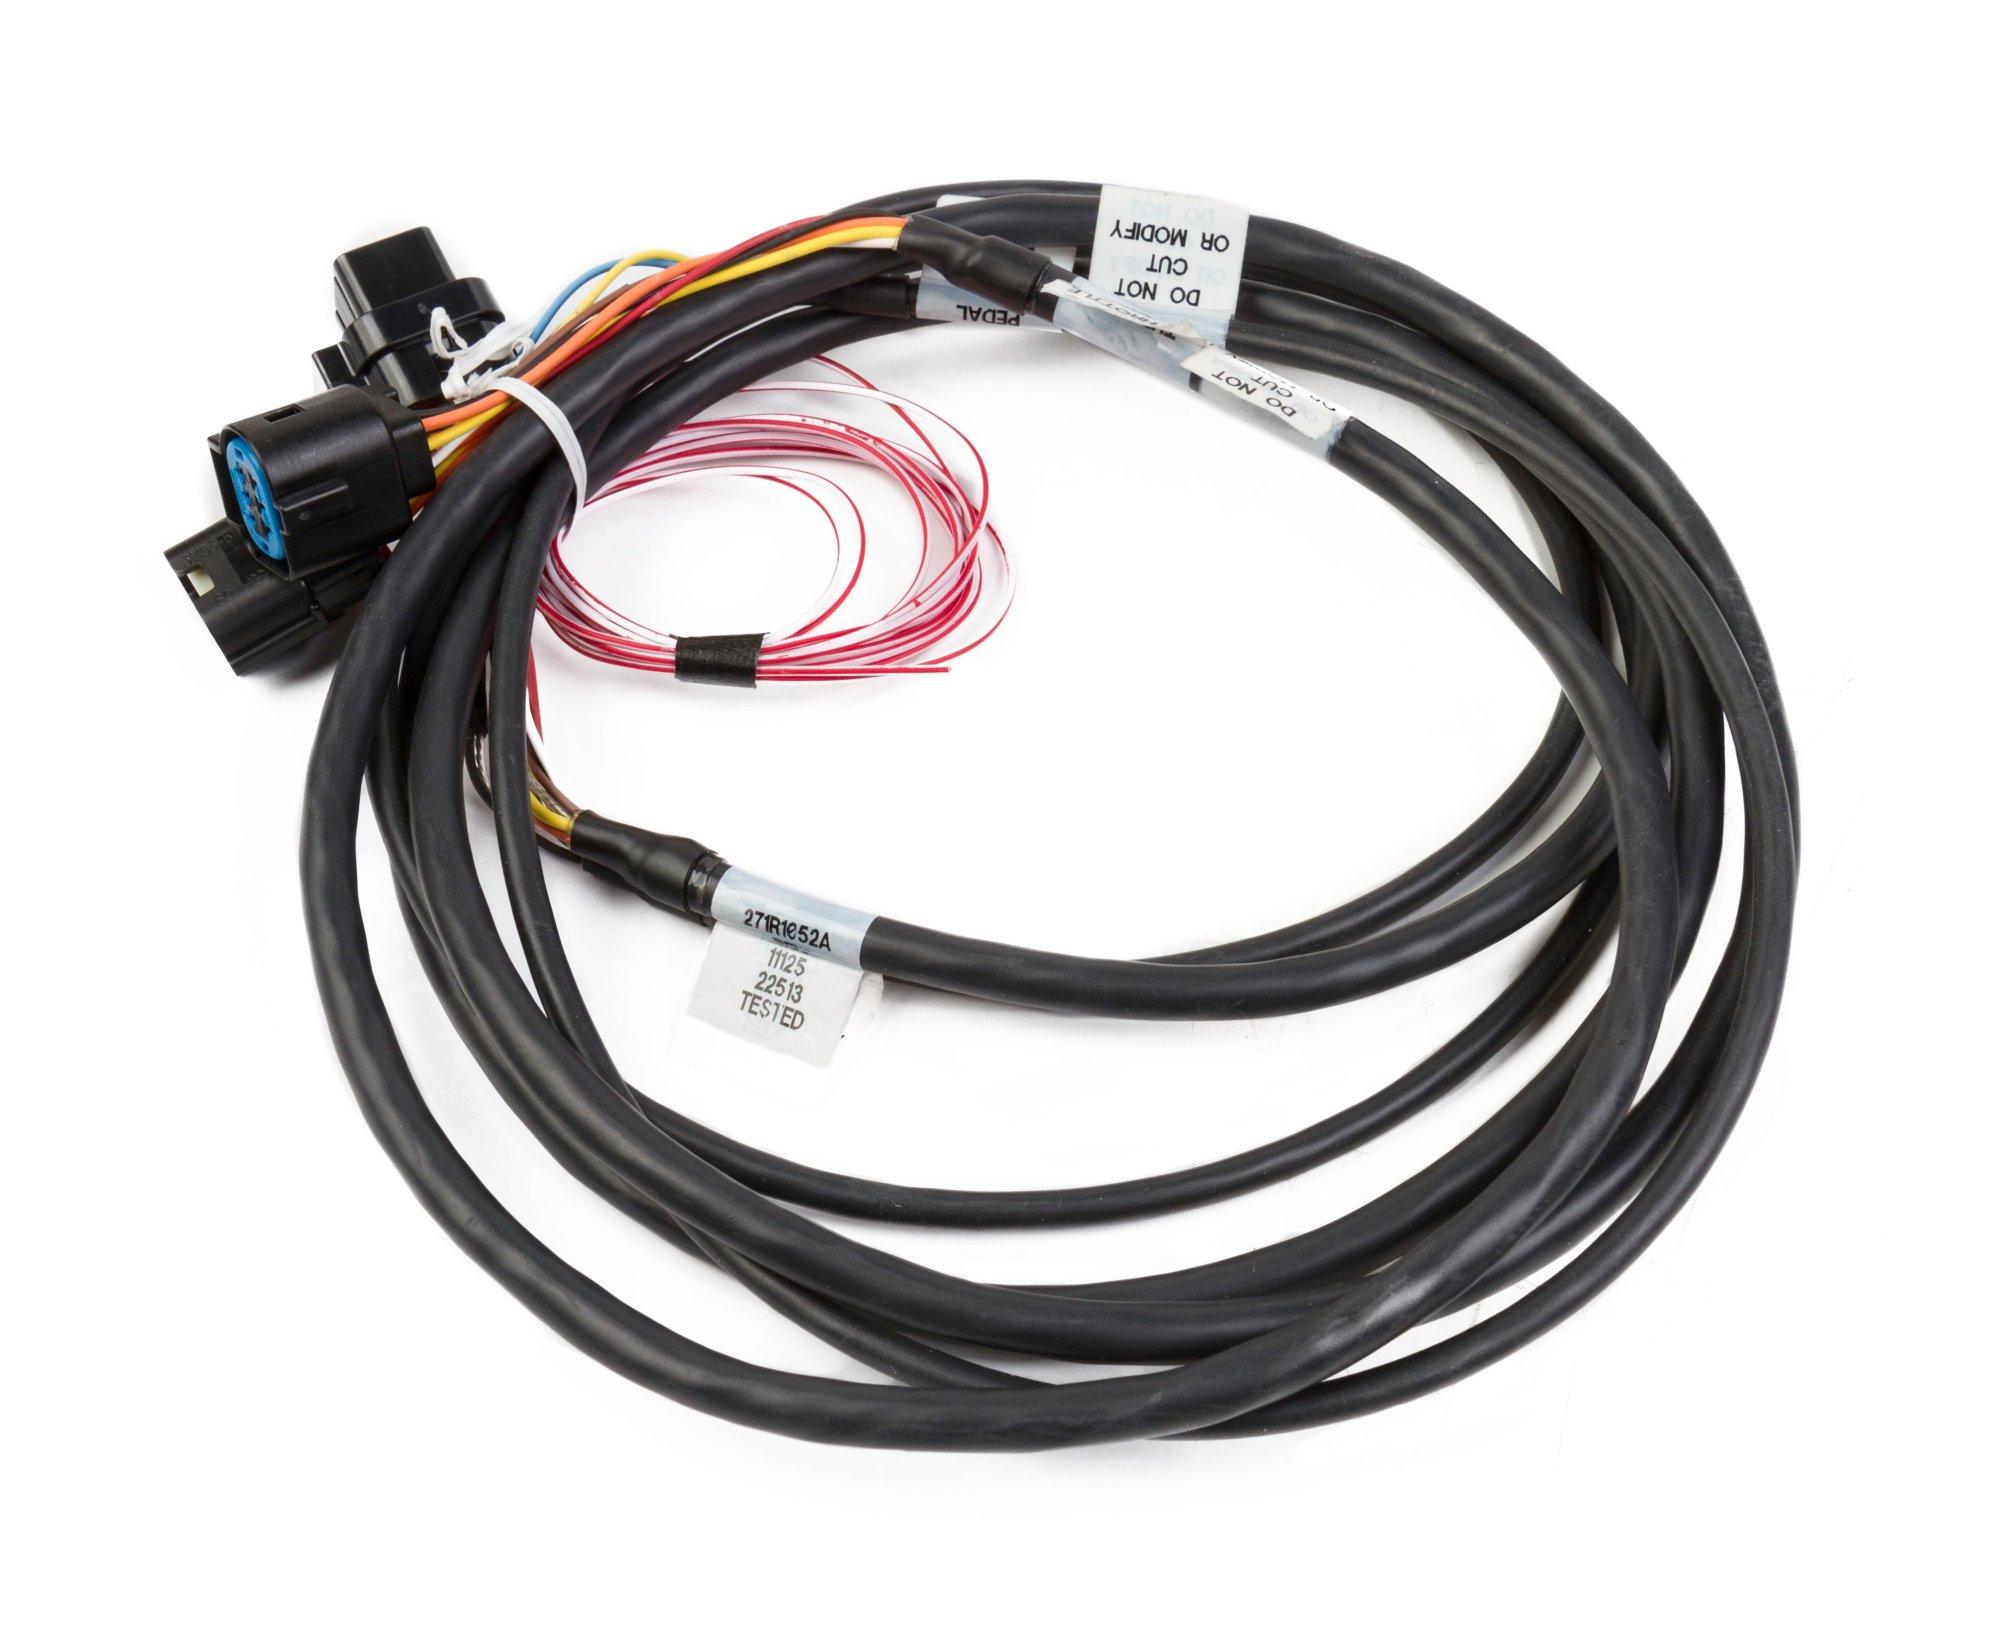 hight resolution of holley efi 558 418 gen iii hemi drive by wire harness late pedal hemi swap wiring harness hemi wiring harness